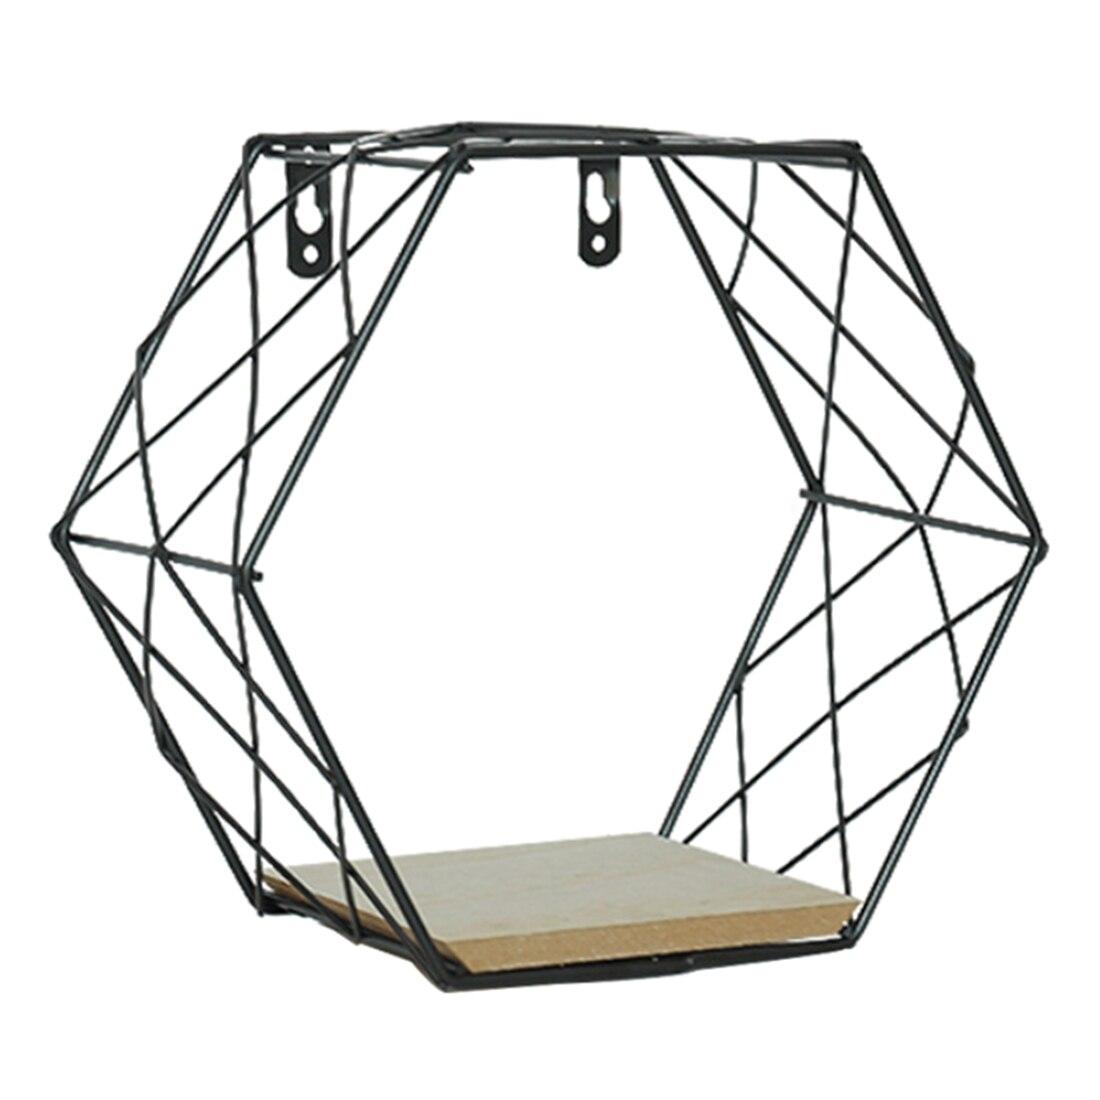 Wrought Nordic Iron Hexagon Grid Wall Shelf Geometry Ornament Storage Hanging Rack - Black S